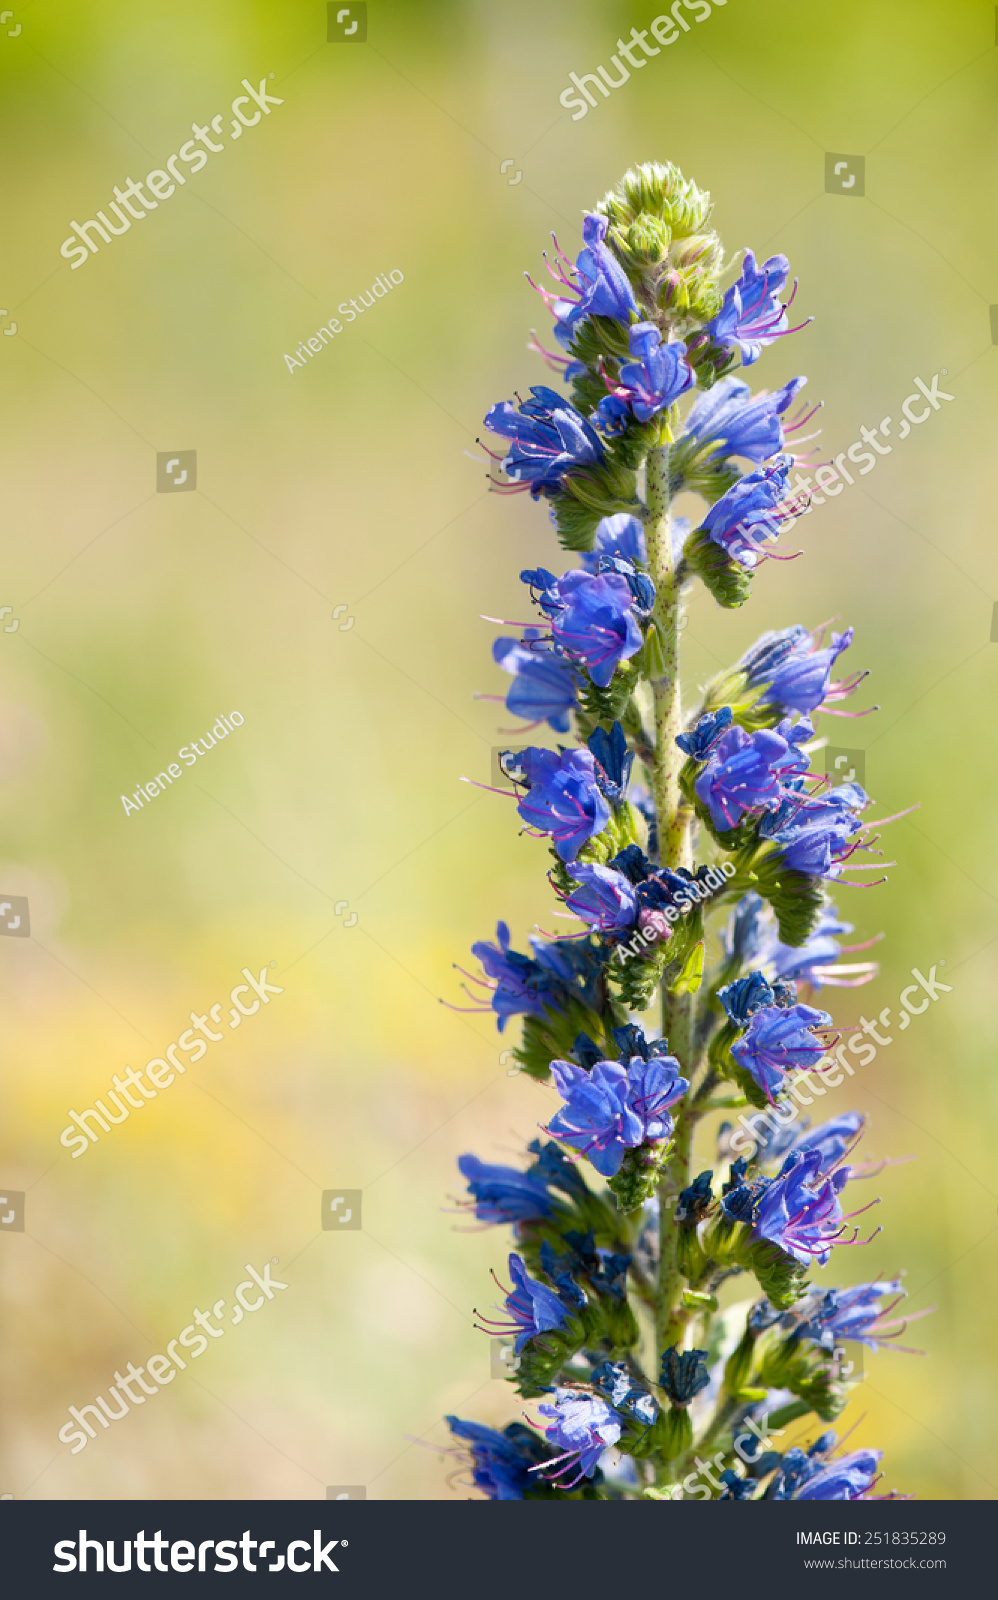 Echium Vulgare Blue Weed Flowering Plant Stock Photo Edit Now